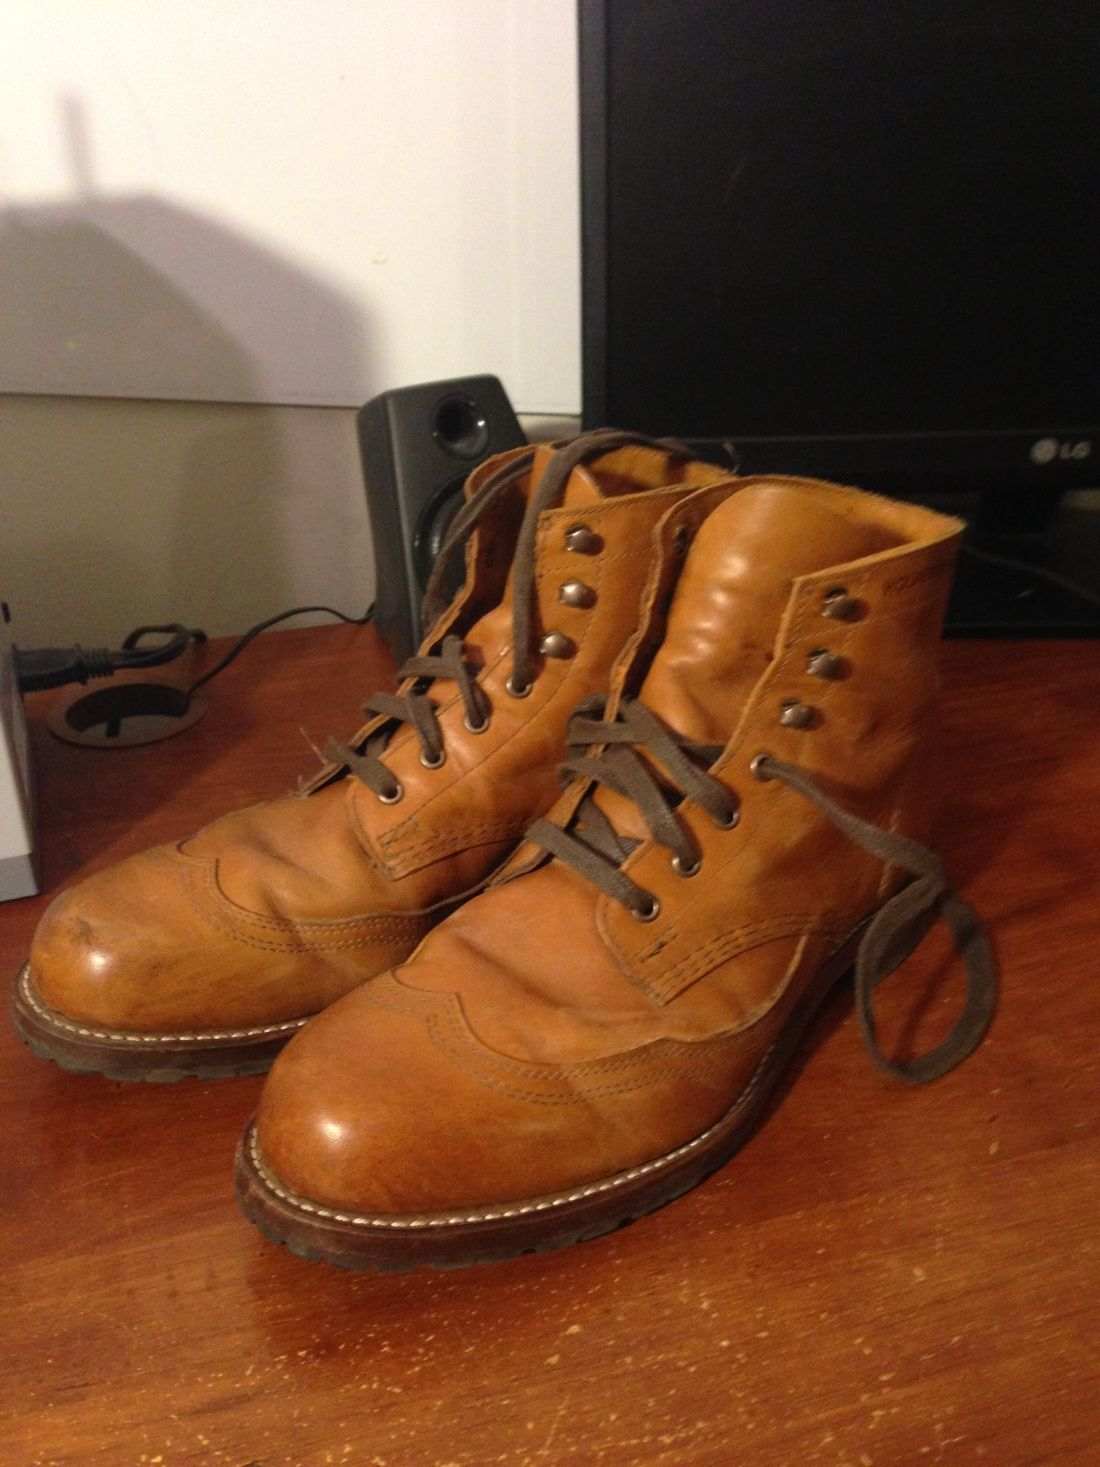 66239ab3767 Wolverine Wolverine 1000 Mile Tan Men's Addison Wingtip Boots Size ...